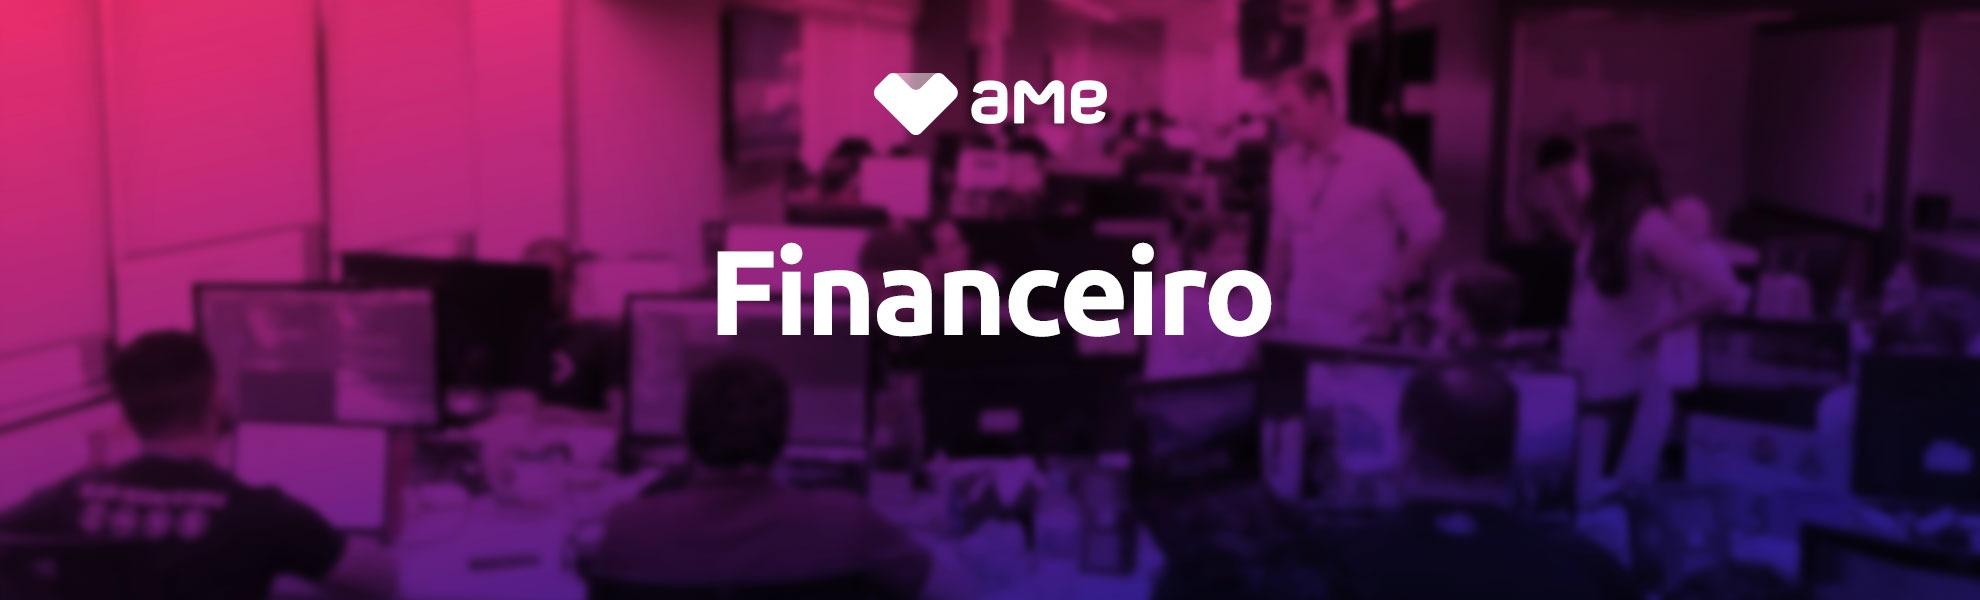 Coordenador de Planejamento Financeiro